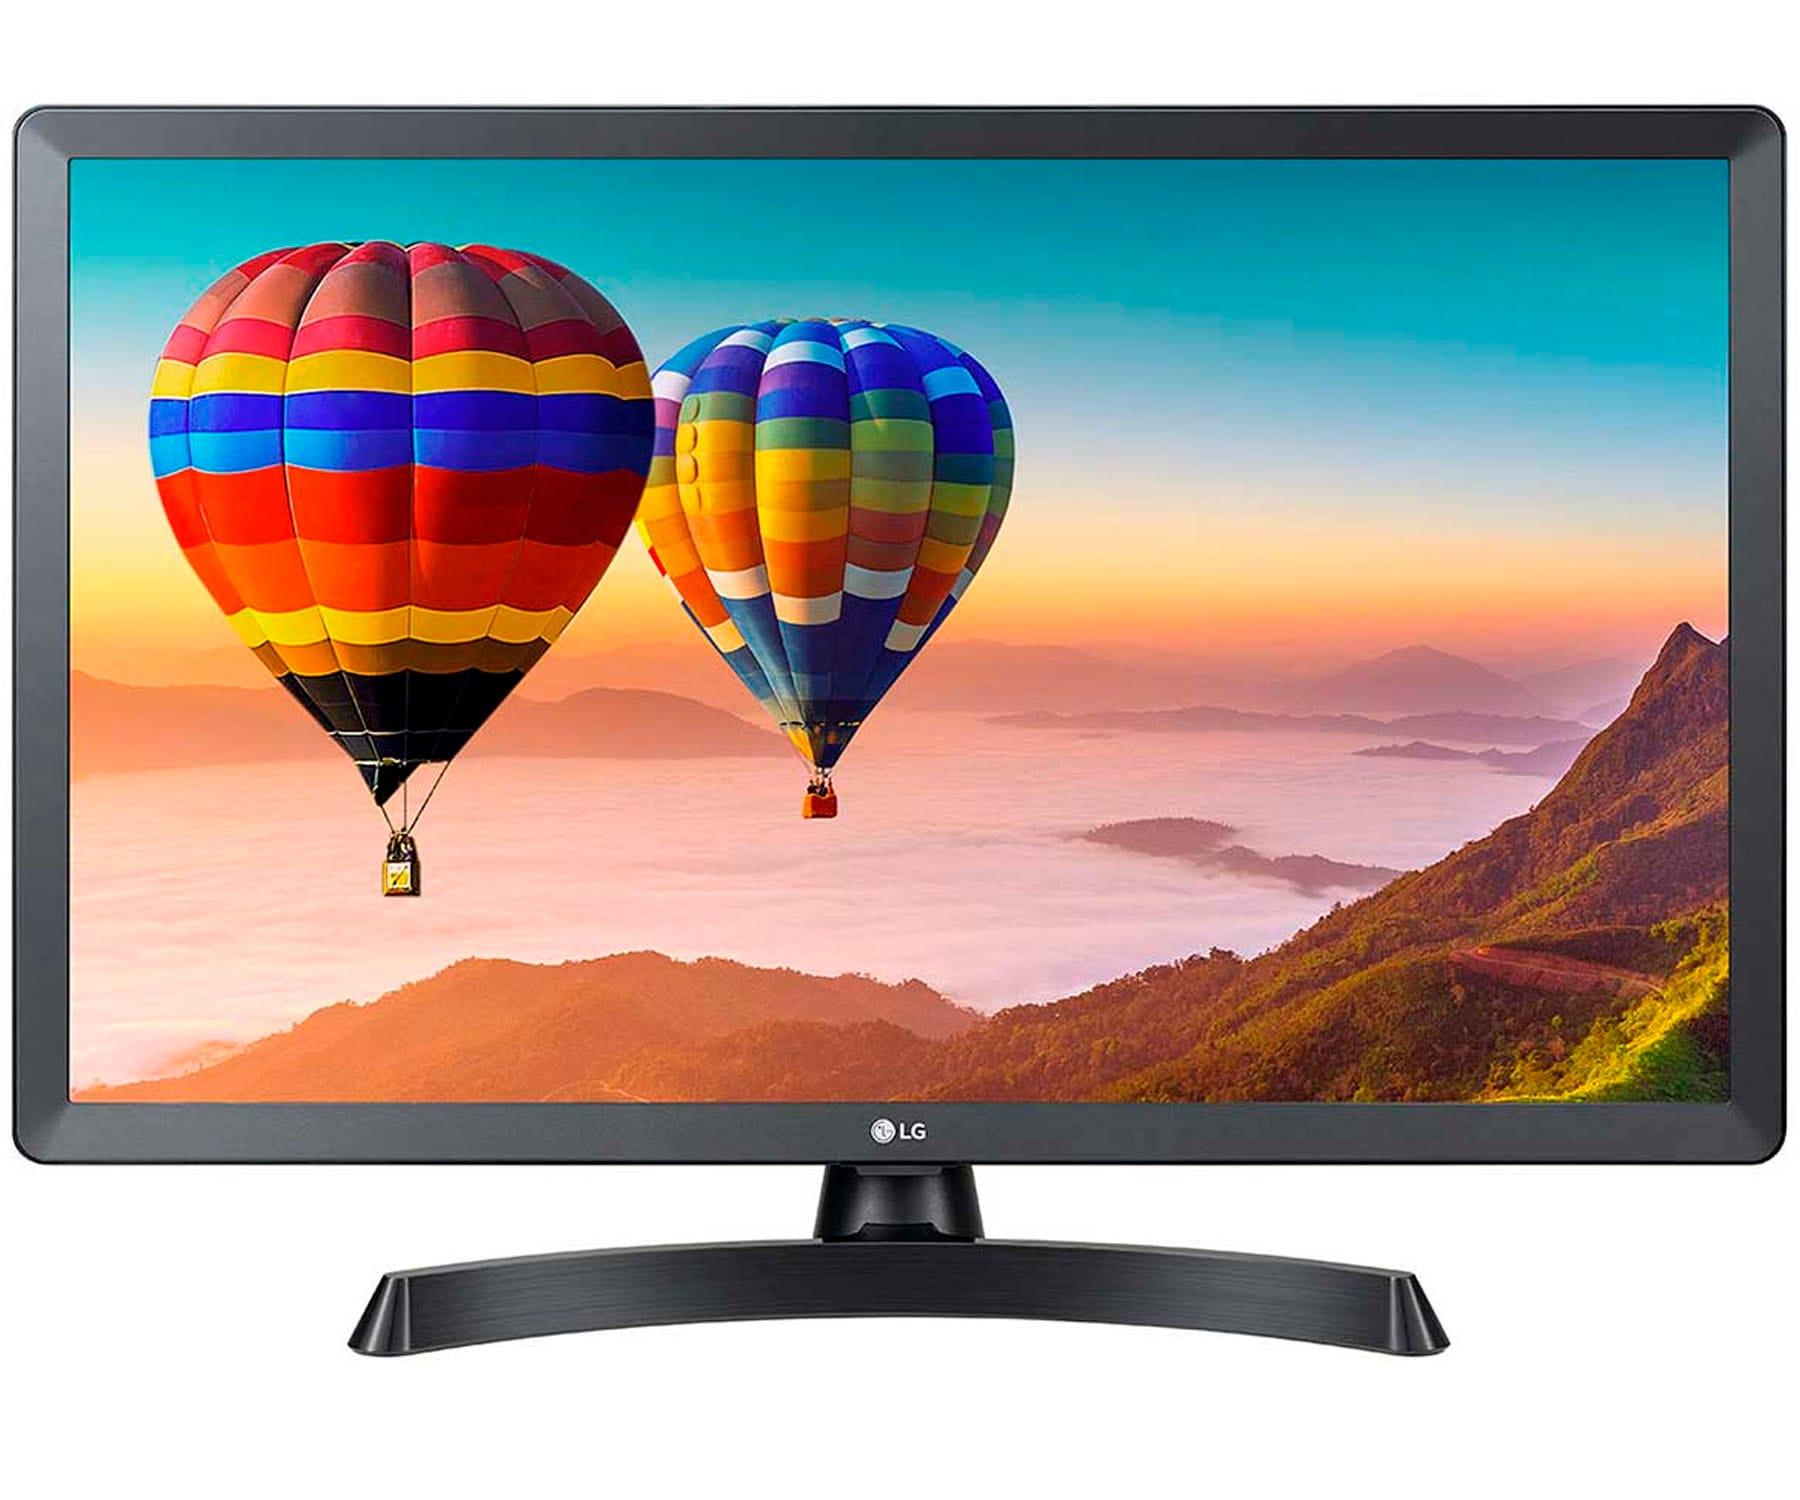 LG 28TN515S-PZ NEGRO TELEVISOR MONITOR 28'' LCD LED HD READY SMART TV